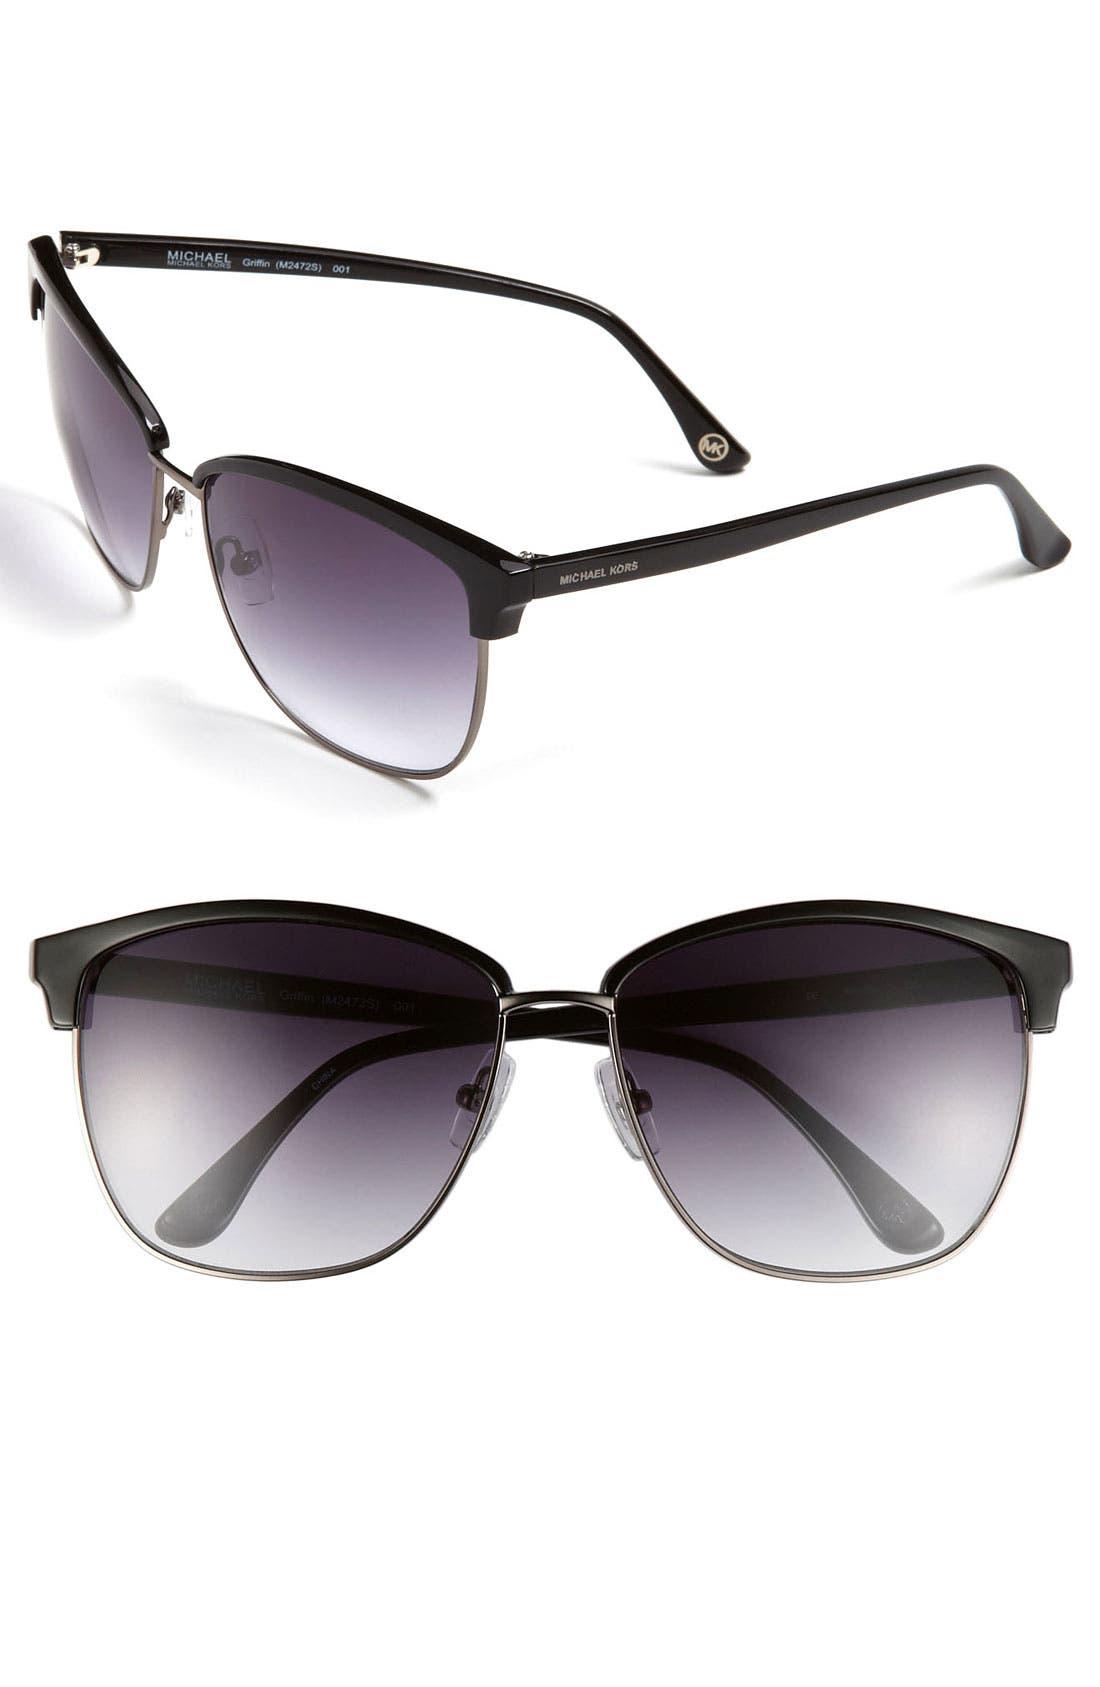 Alternate Image 1 Selected - MICHAEL Michael Kors 'Griffin' 60mm Retro Sunglasses